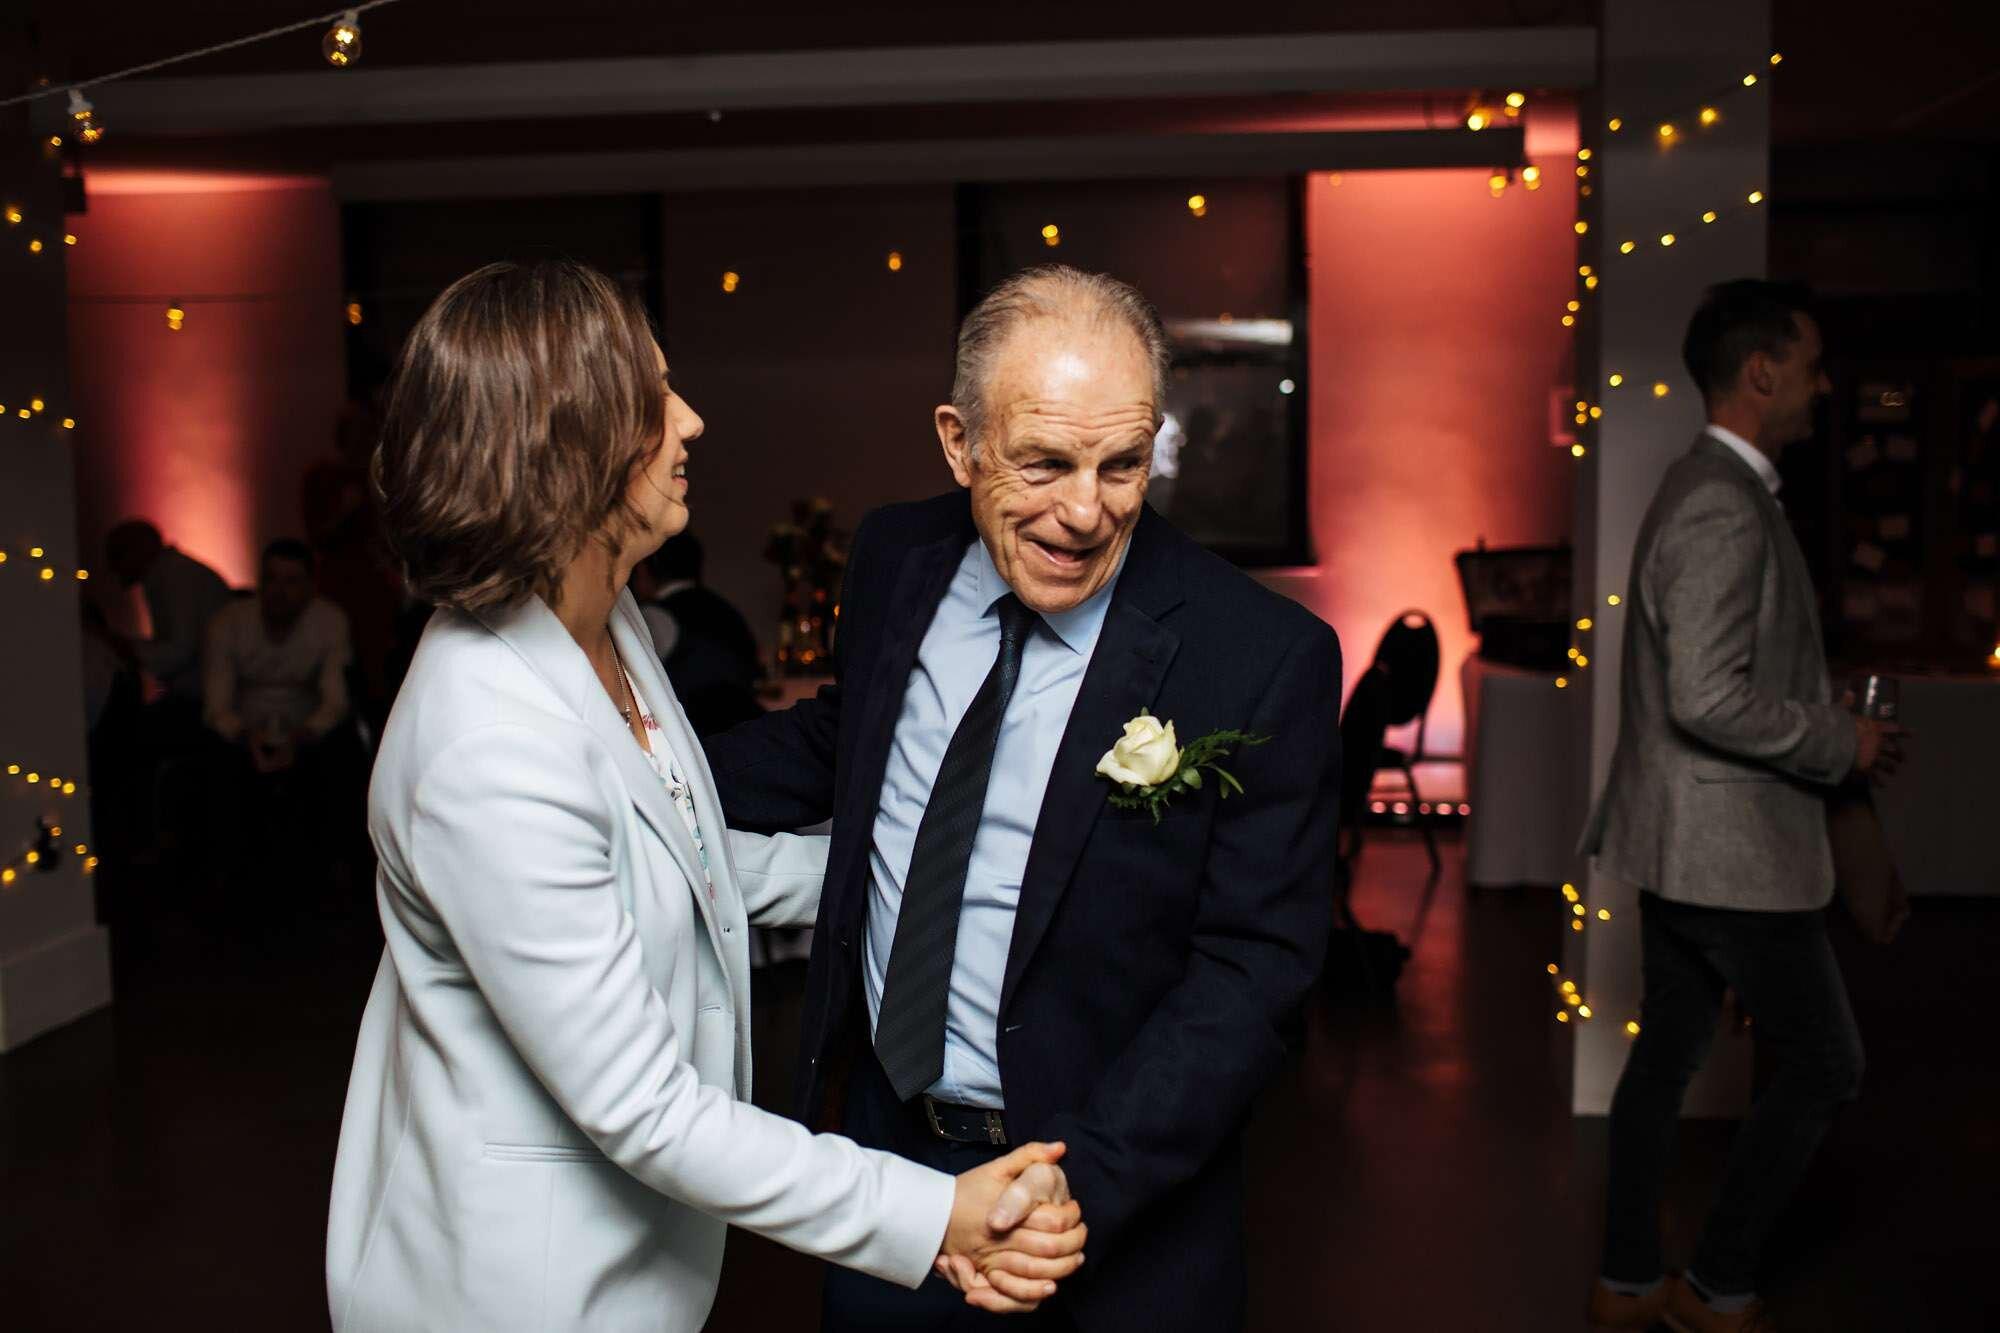 Bride and dad dancing at her wedding at The Tetley Leeds